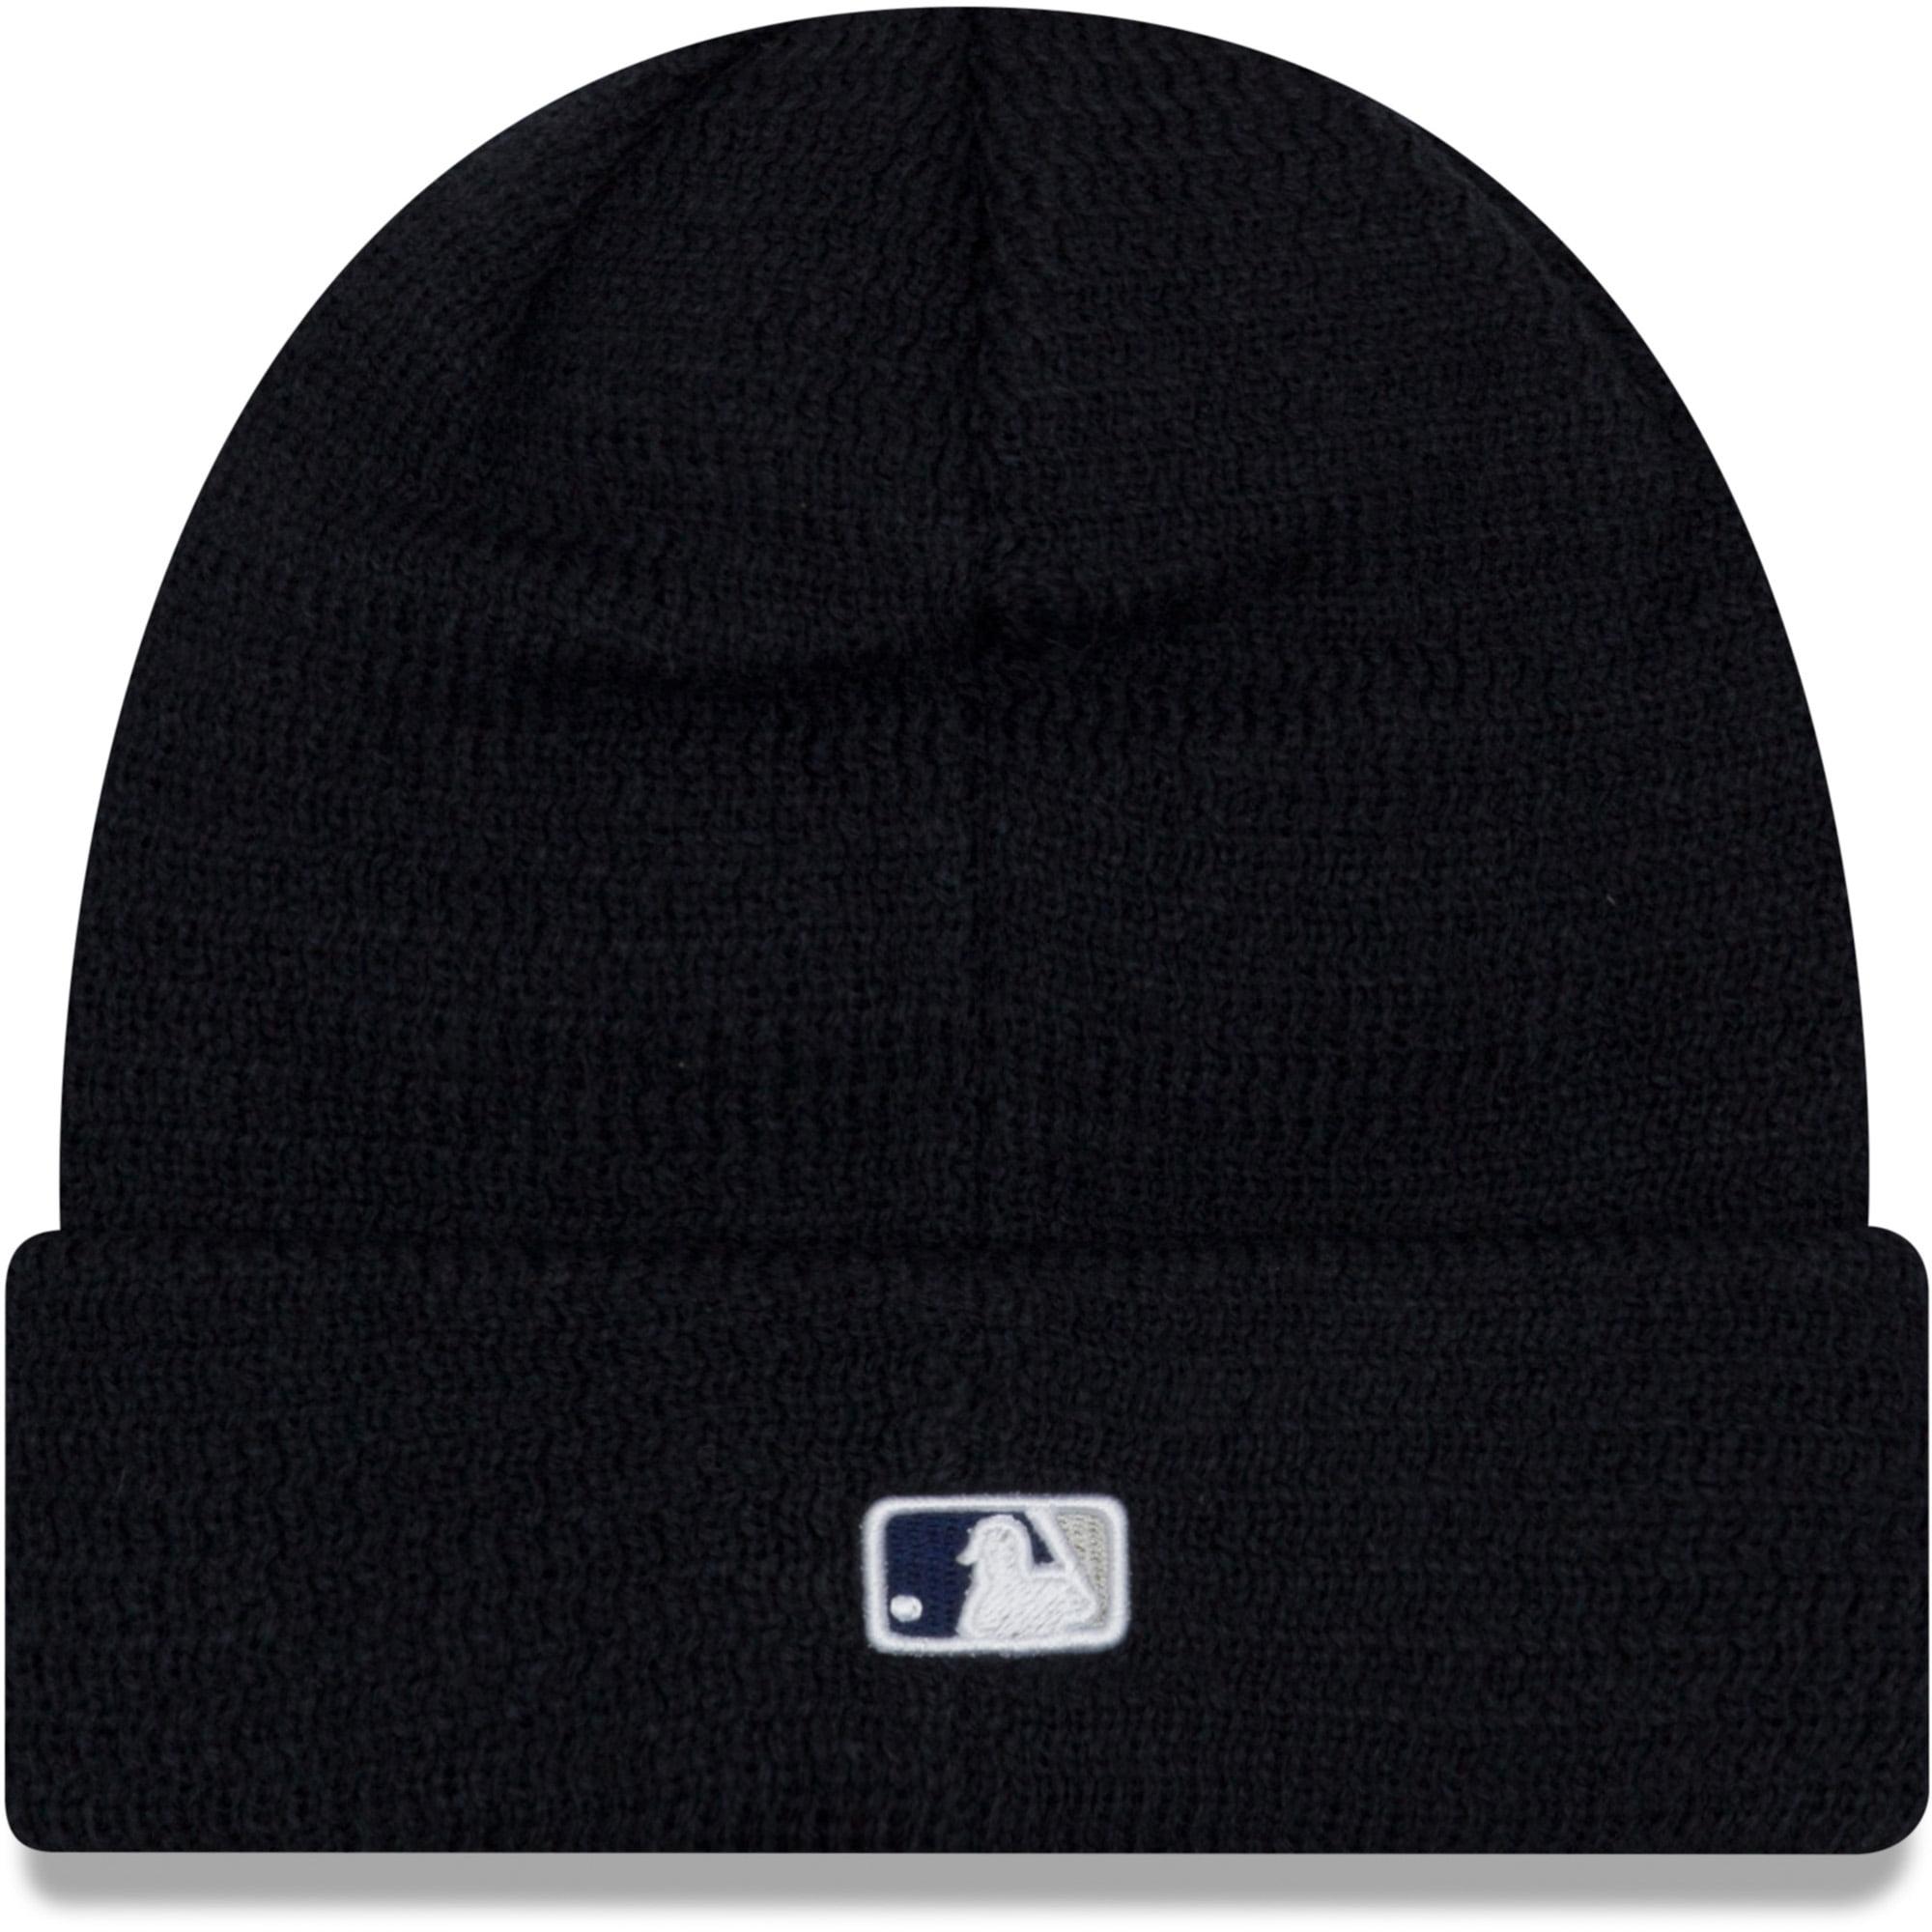 New York Yankees New Era Youth On-Field Sport Cuffed Knit Hat - Navy ... 4966993ae